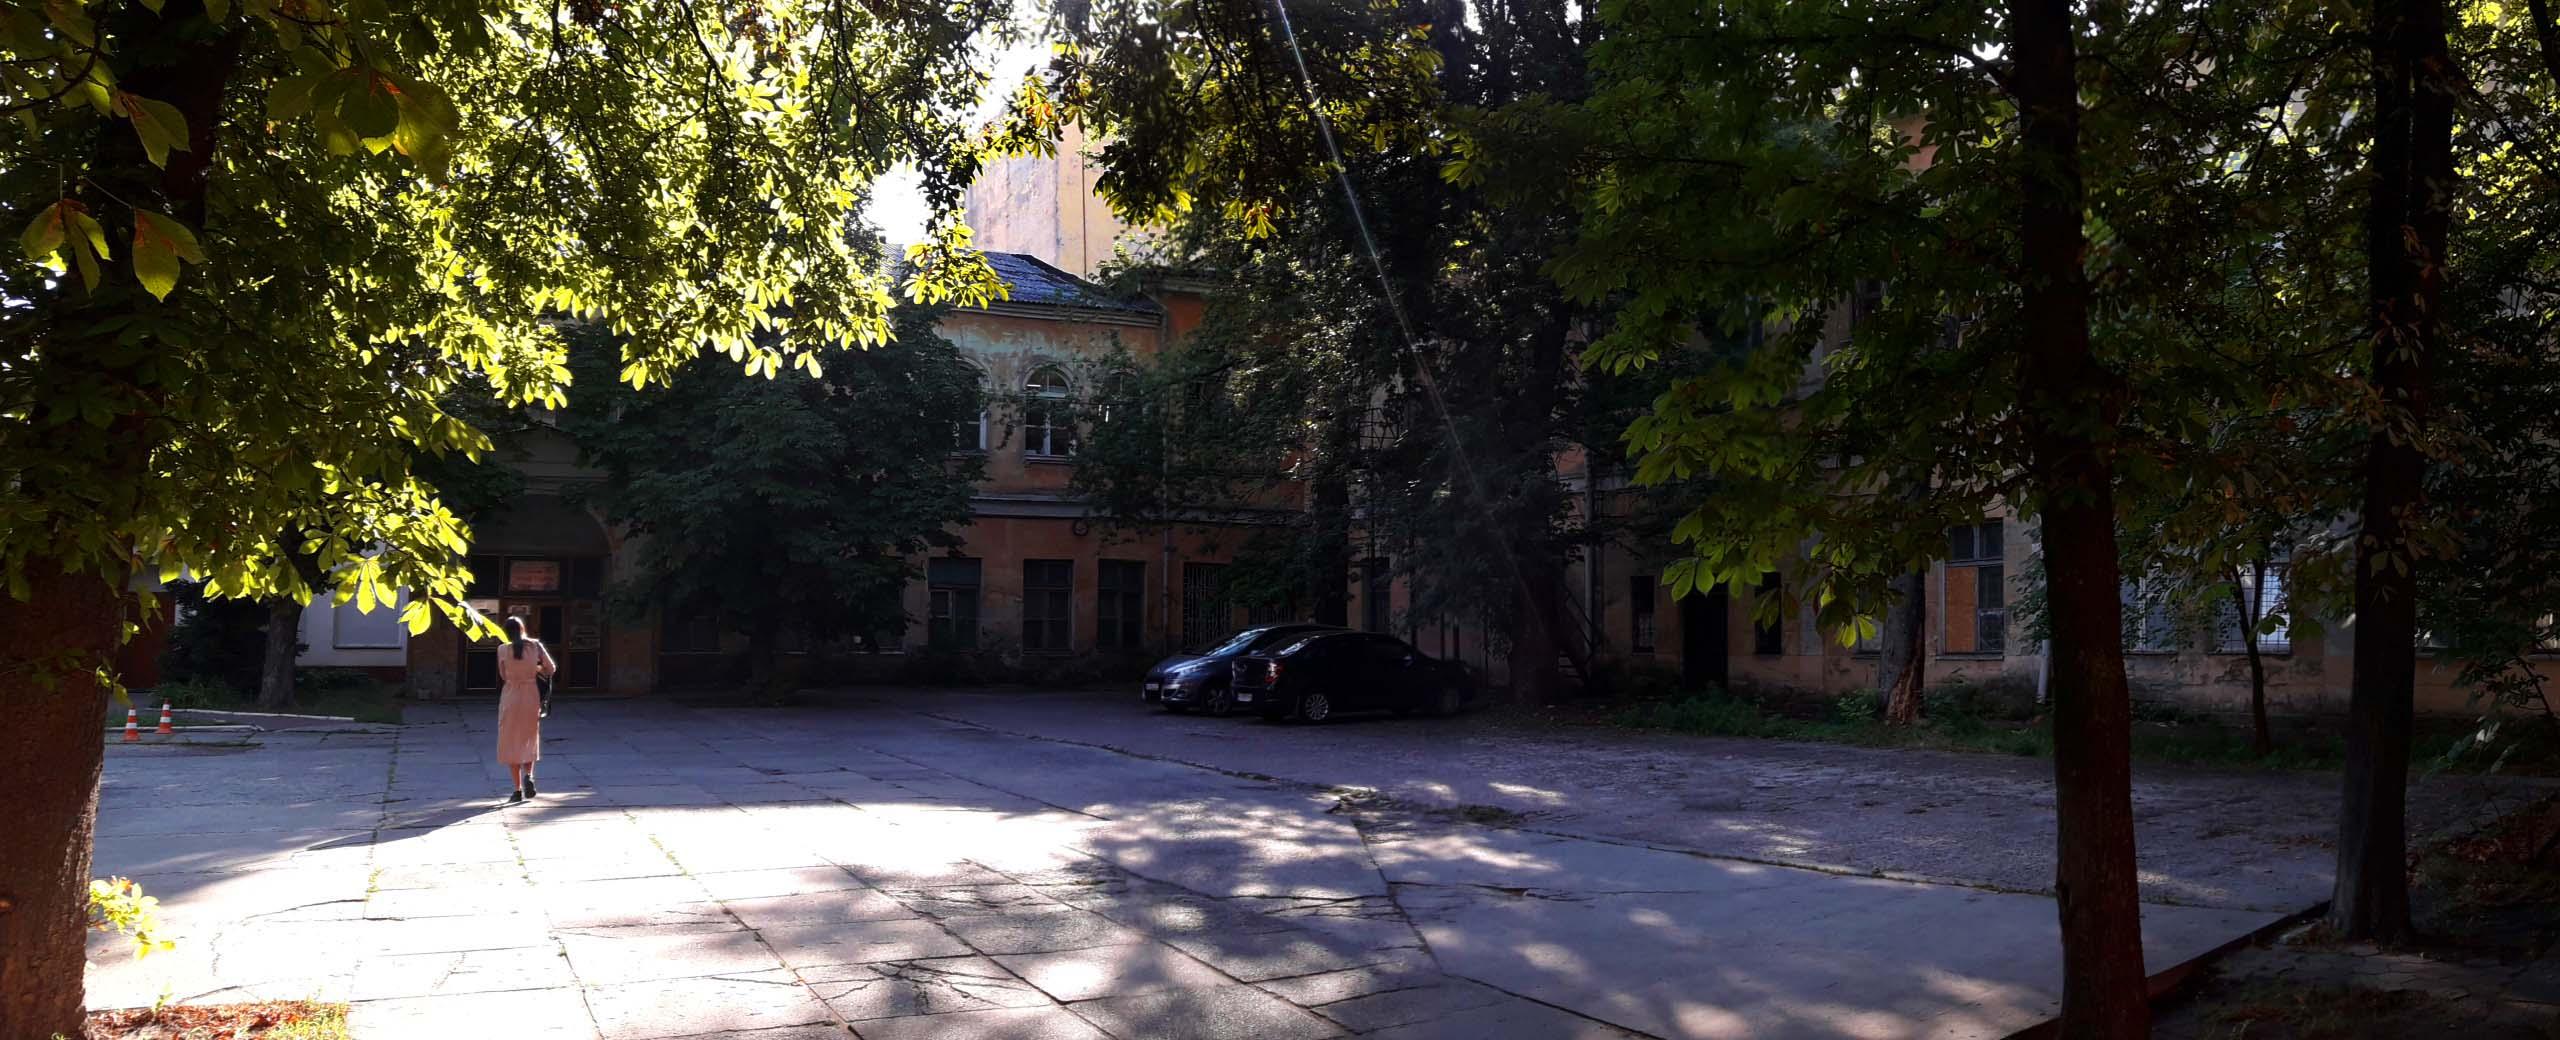 магнитогорская1(5).jpg